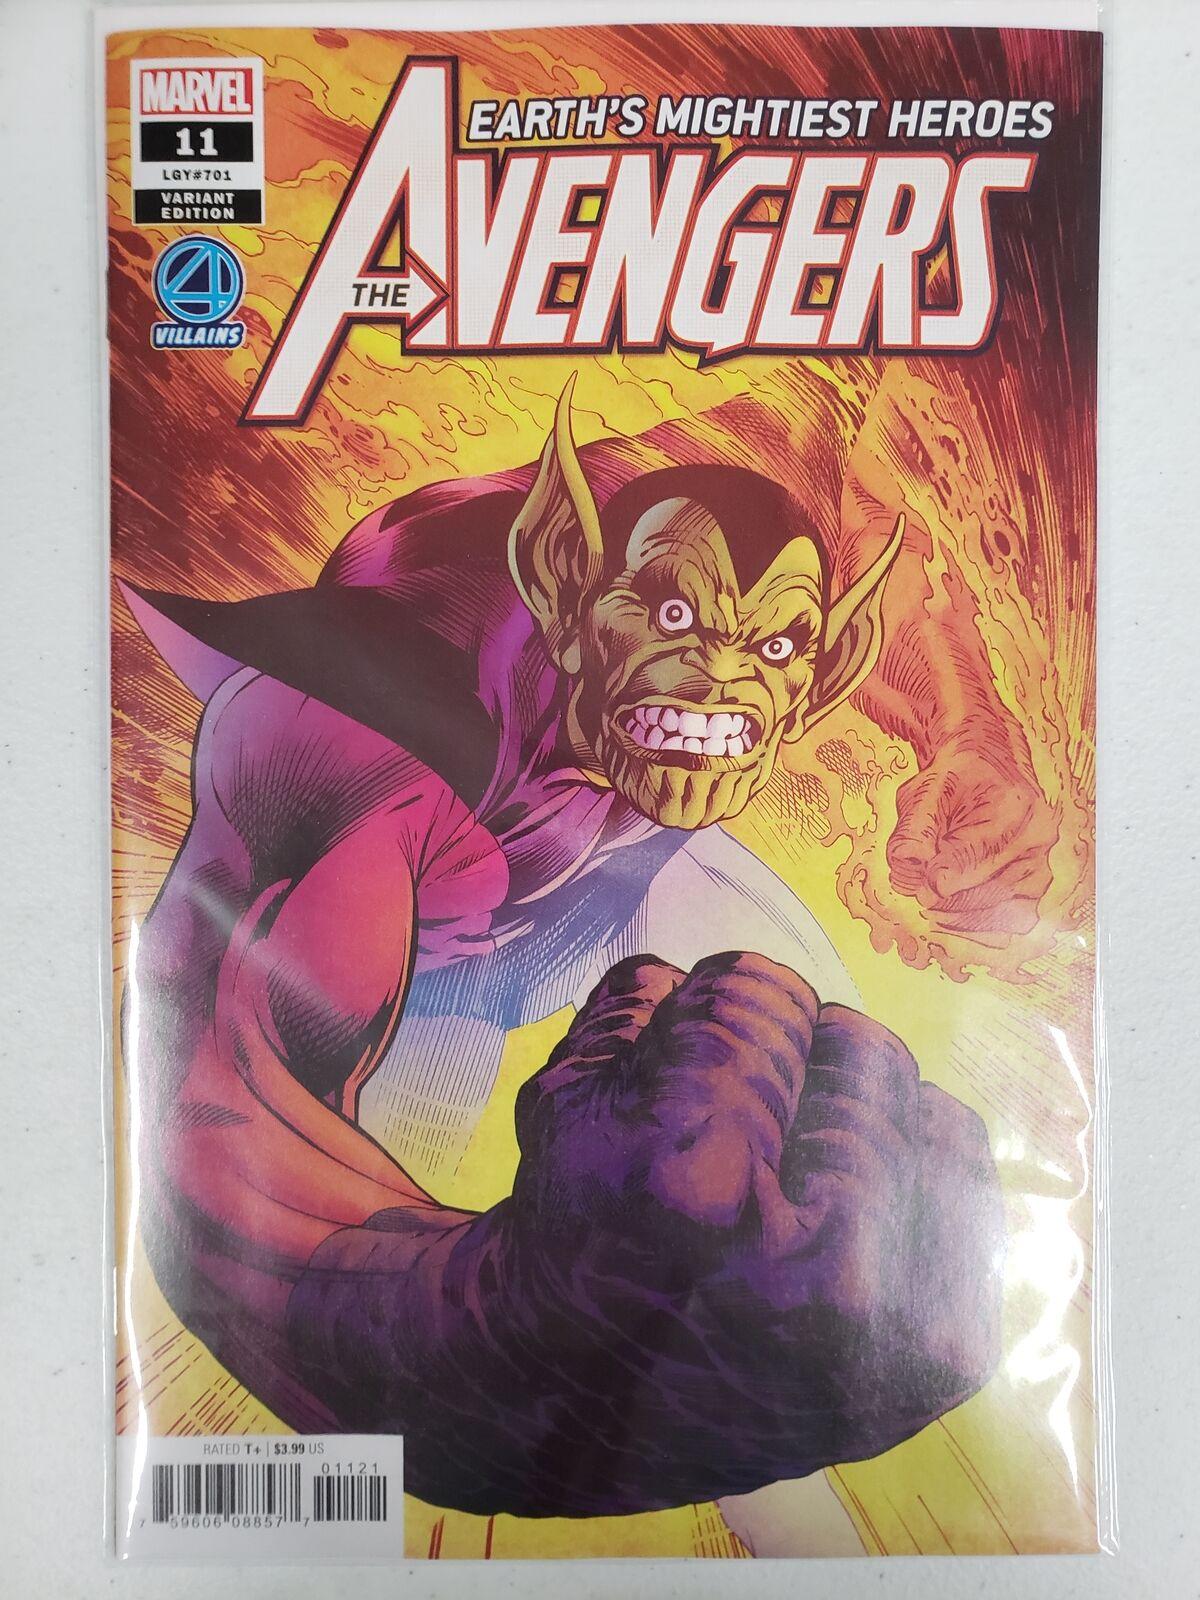 The Avengers #11 Davis Fantastic Four Villains Variant Marvel NM Comics Book